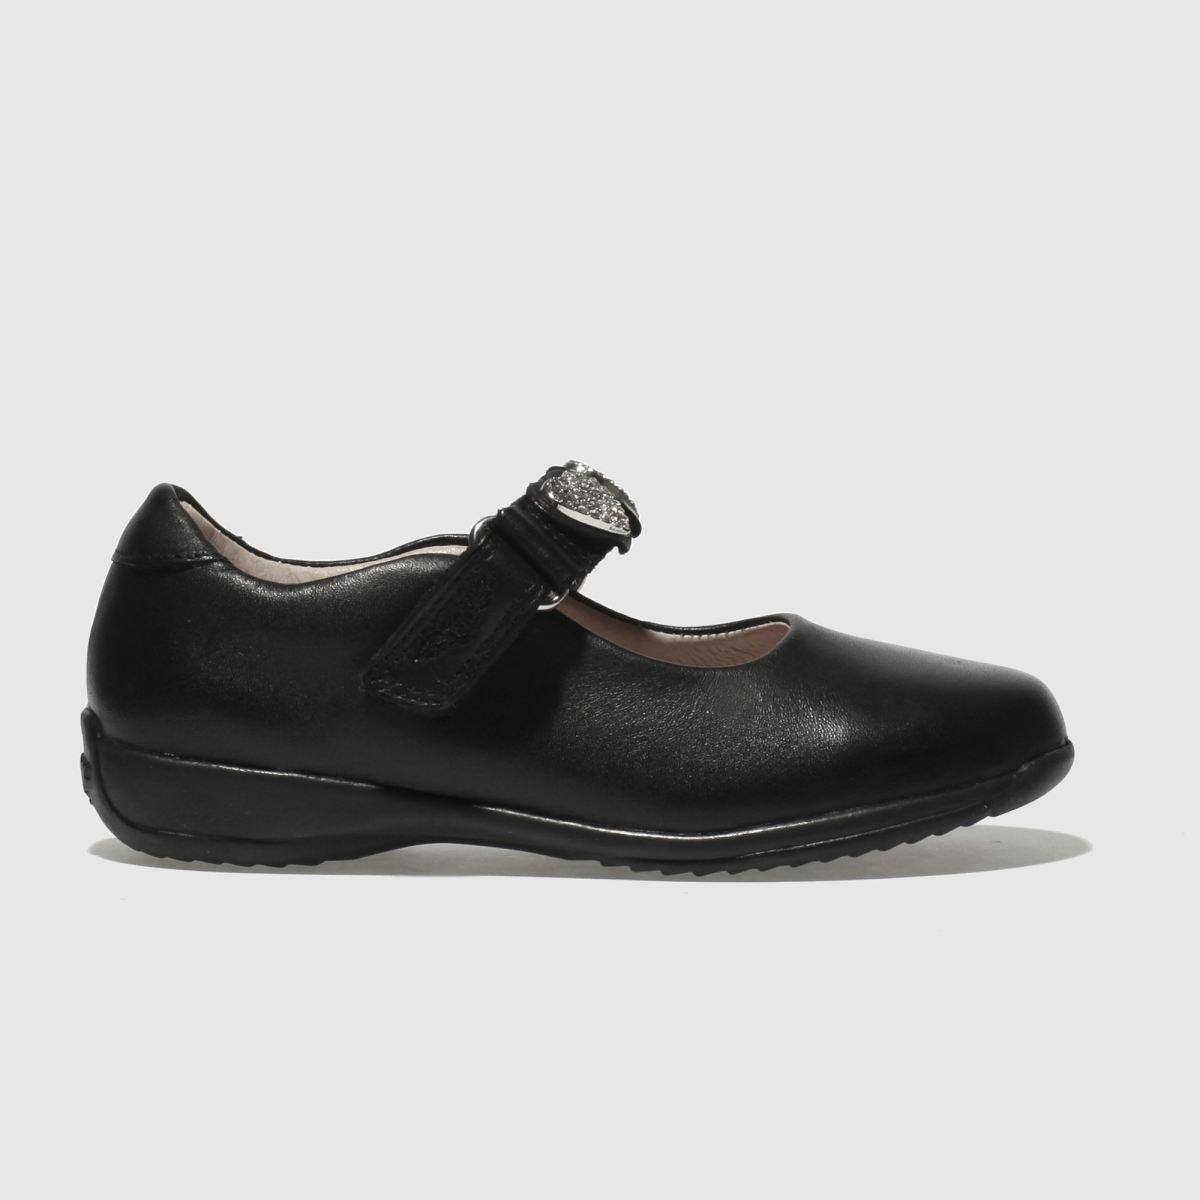 Lelli Kelly Black Ceri Dolly Shoes Toddler